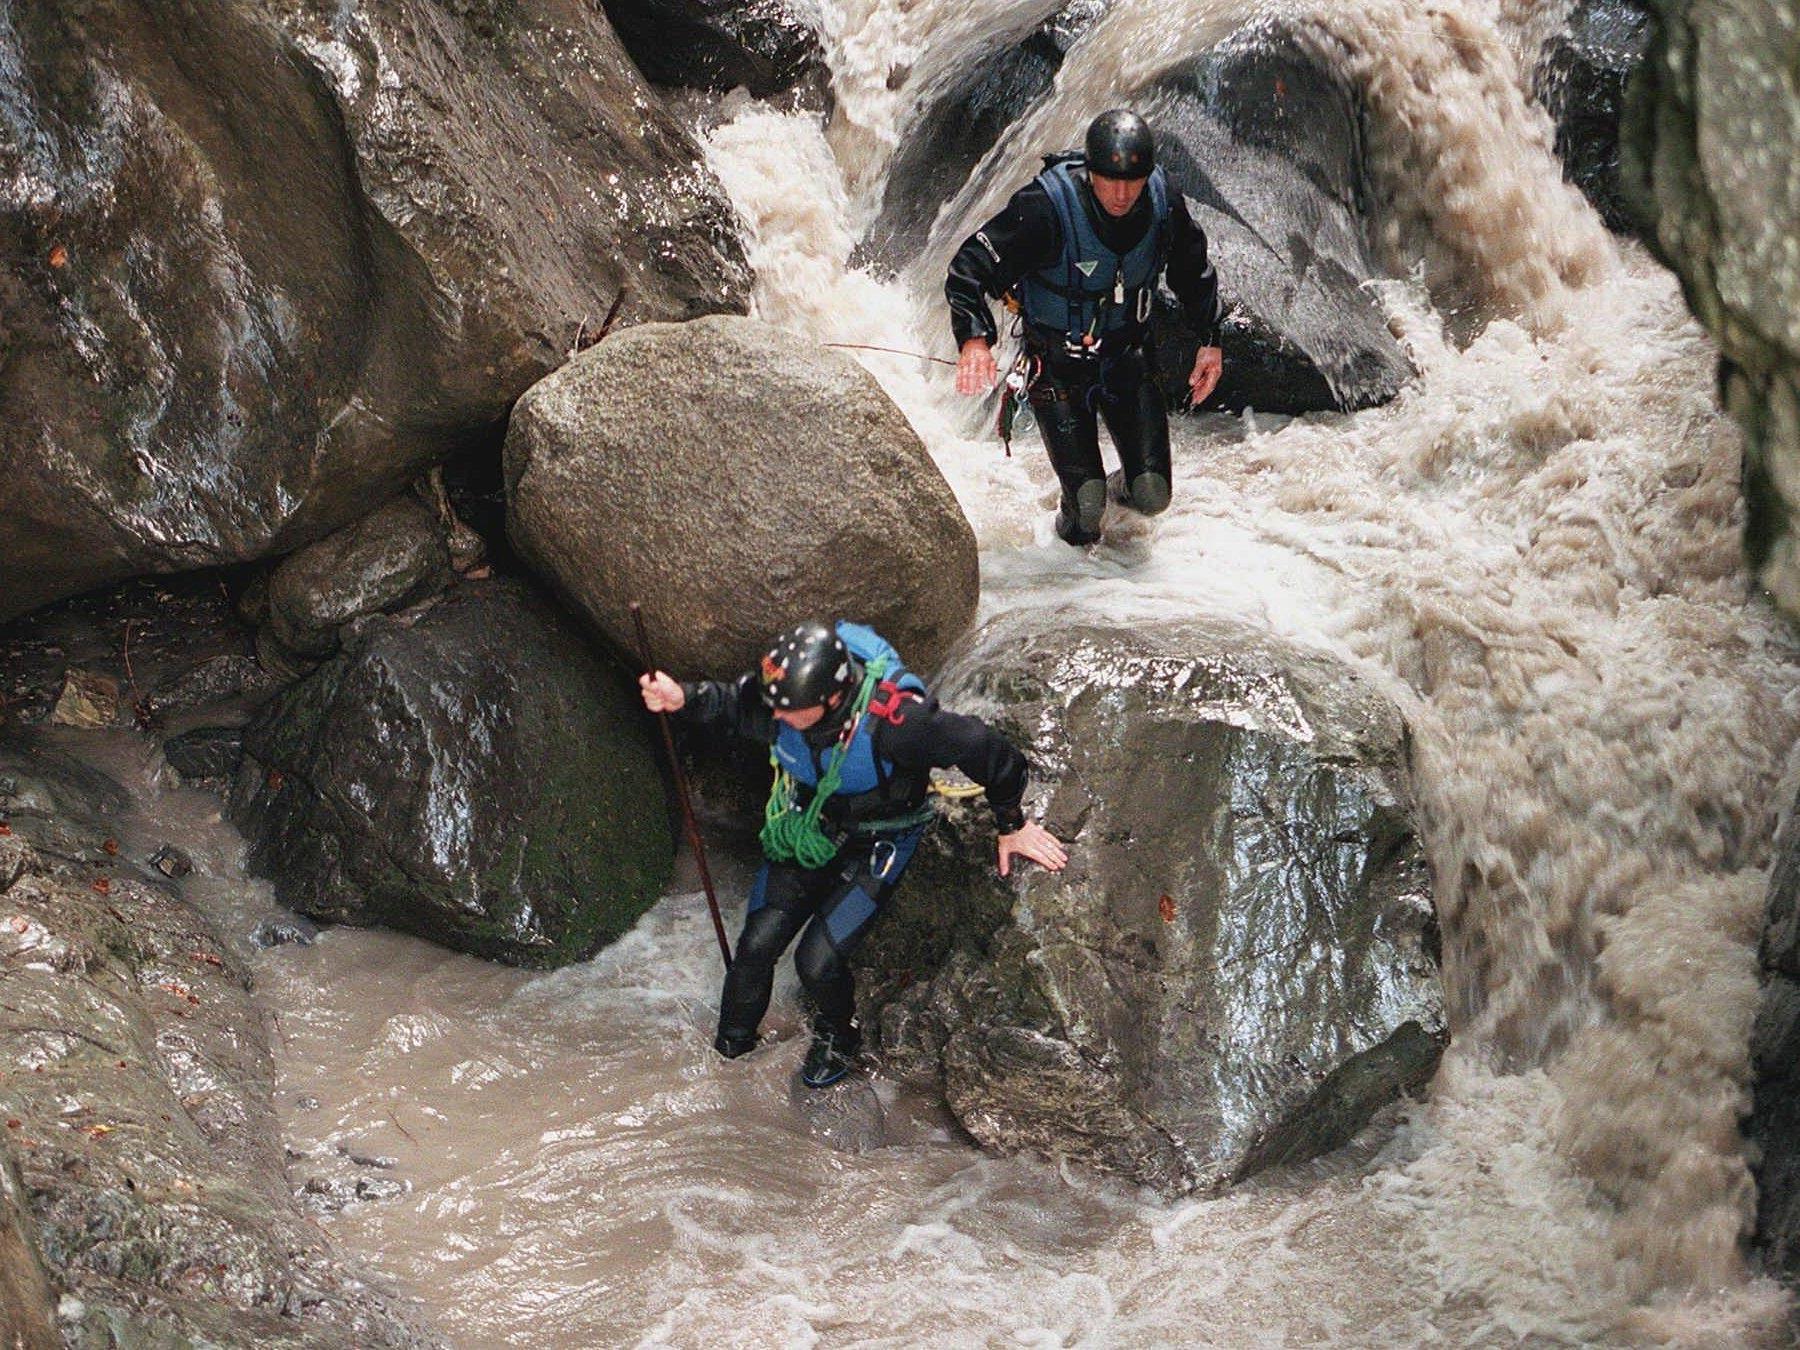 Tödlicher Unfall beim Canyoning im Tiroler Ötztal.